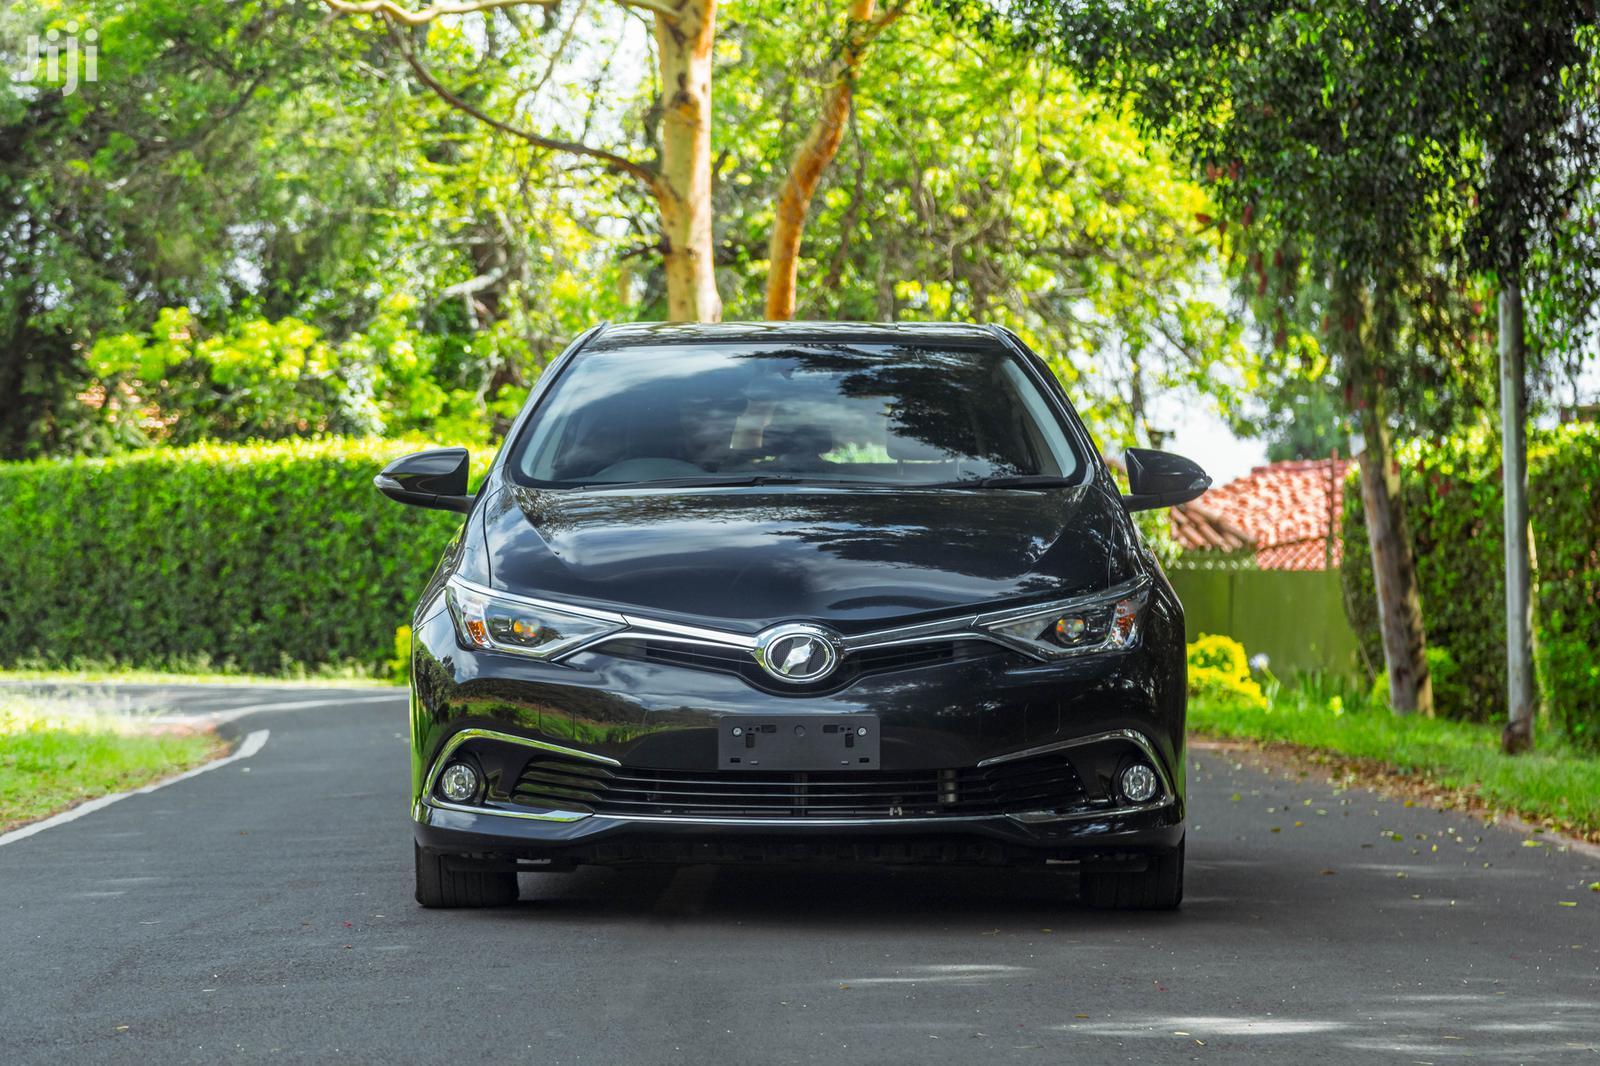 Toyota Auris 2015 Black